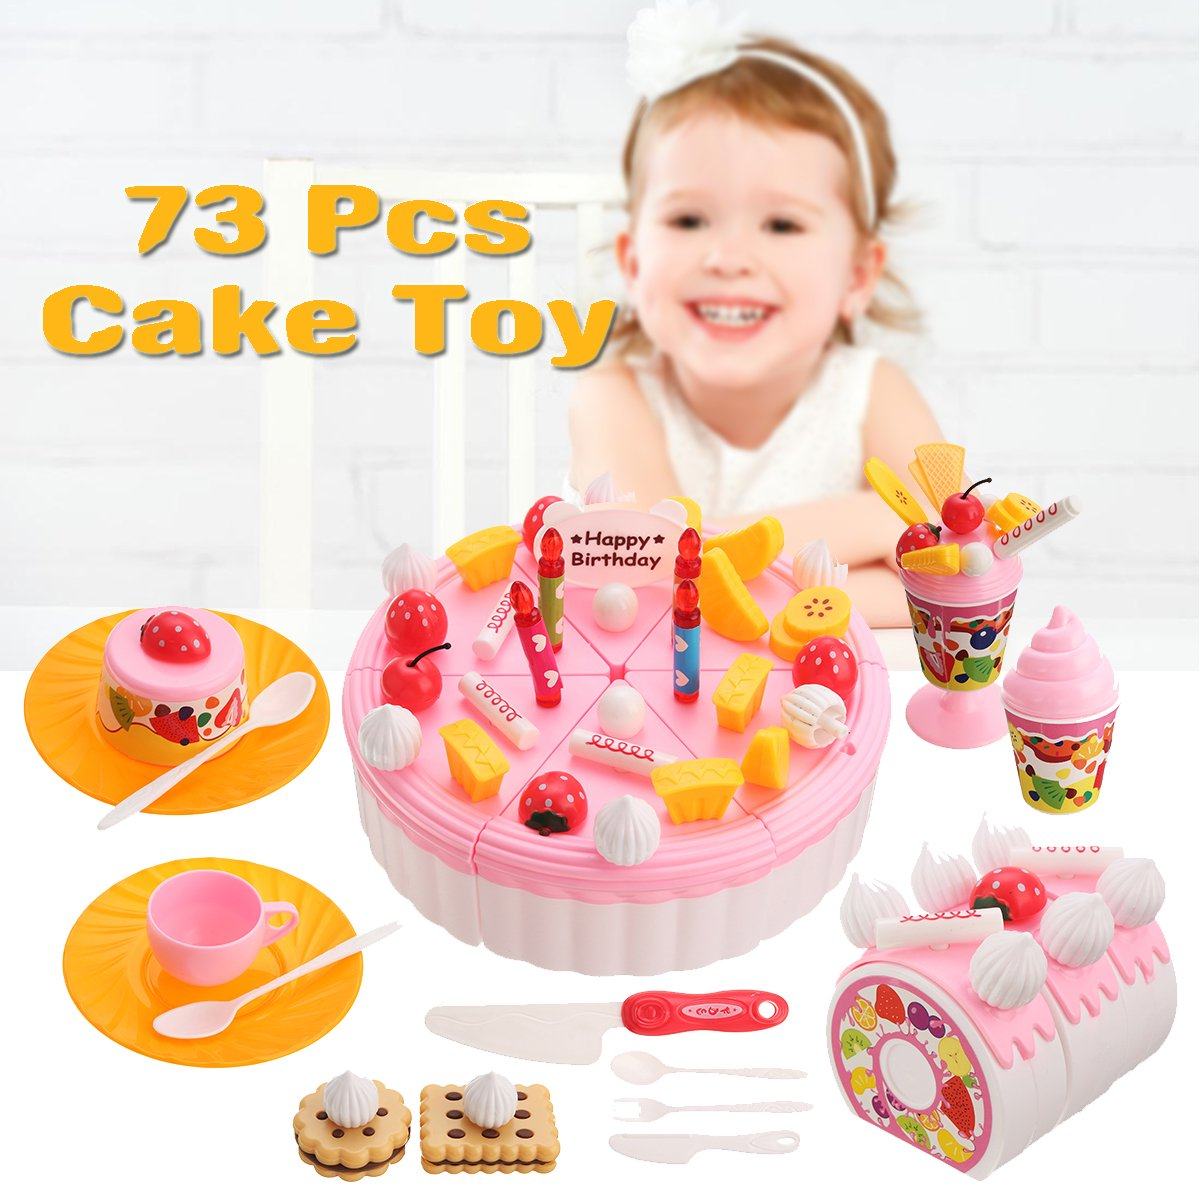 Surprising 73 Pcs Kitchen Cutting Cake Toy Birthday Cake Pretend Play Food Personalised Birthday Cards Veneteletsinfo